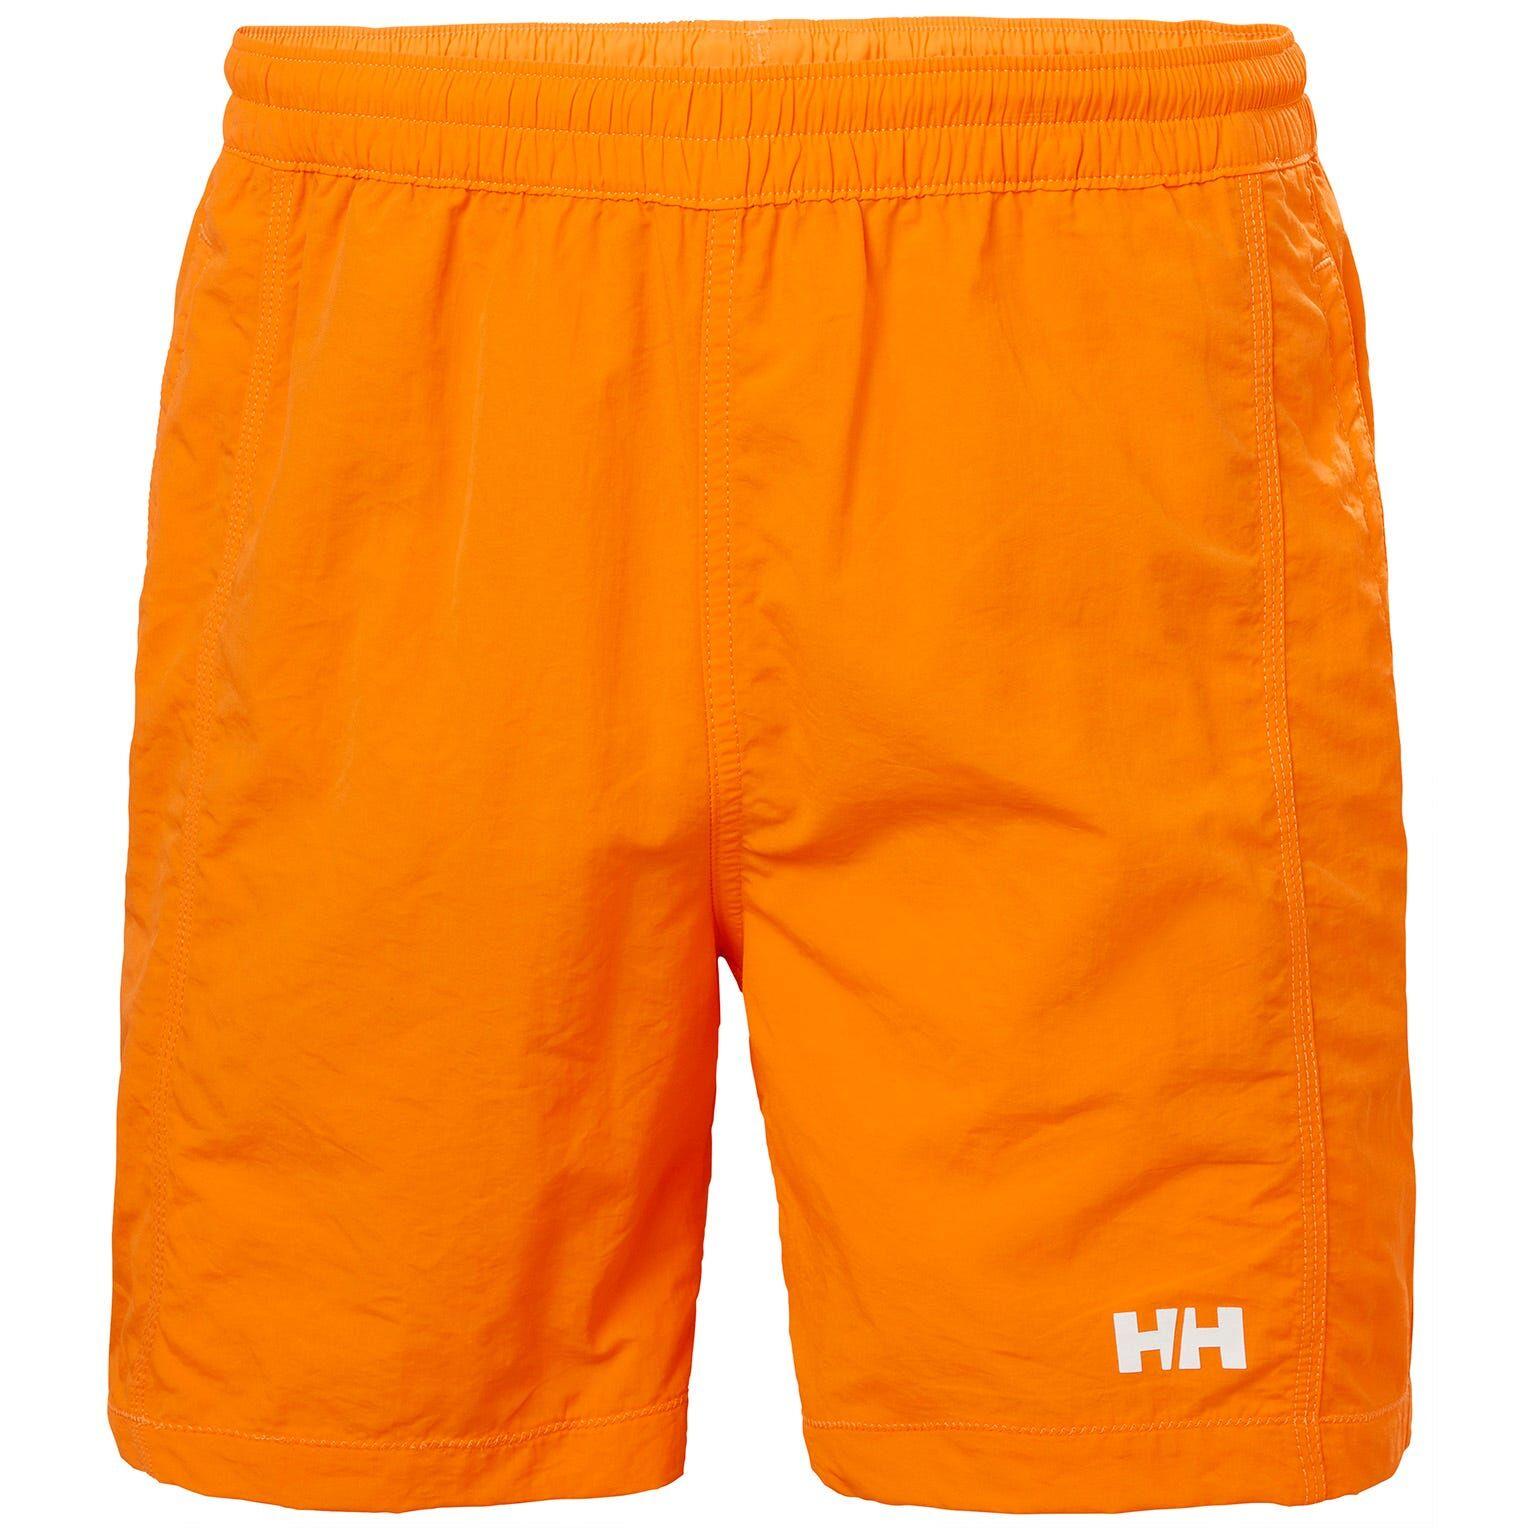 Helly Hansen Herre Calshot Trunk Seilerbukse oransje XL